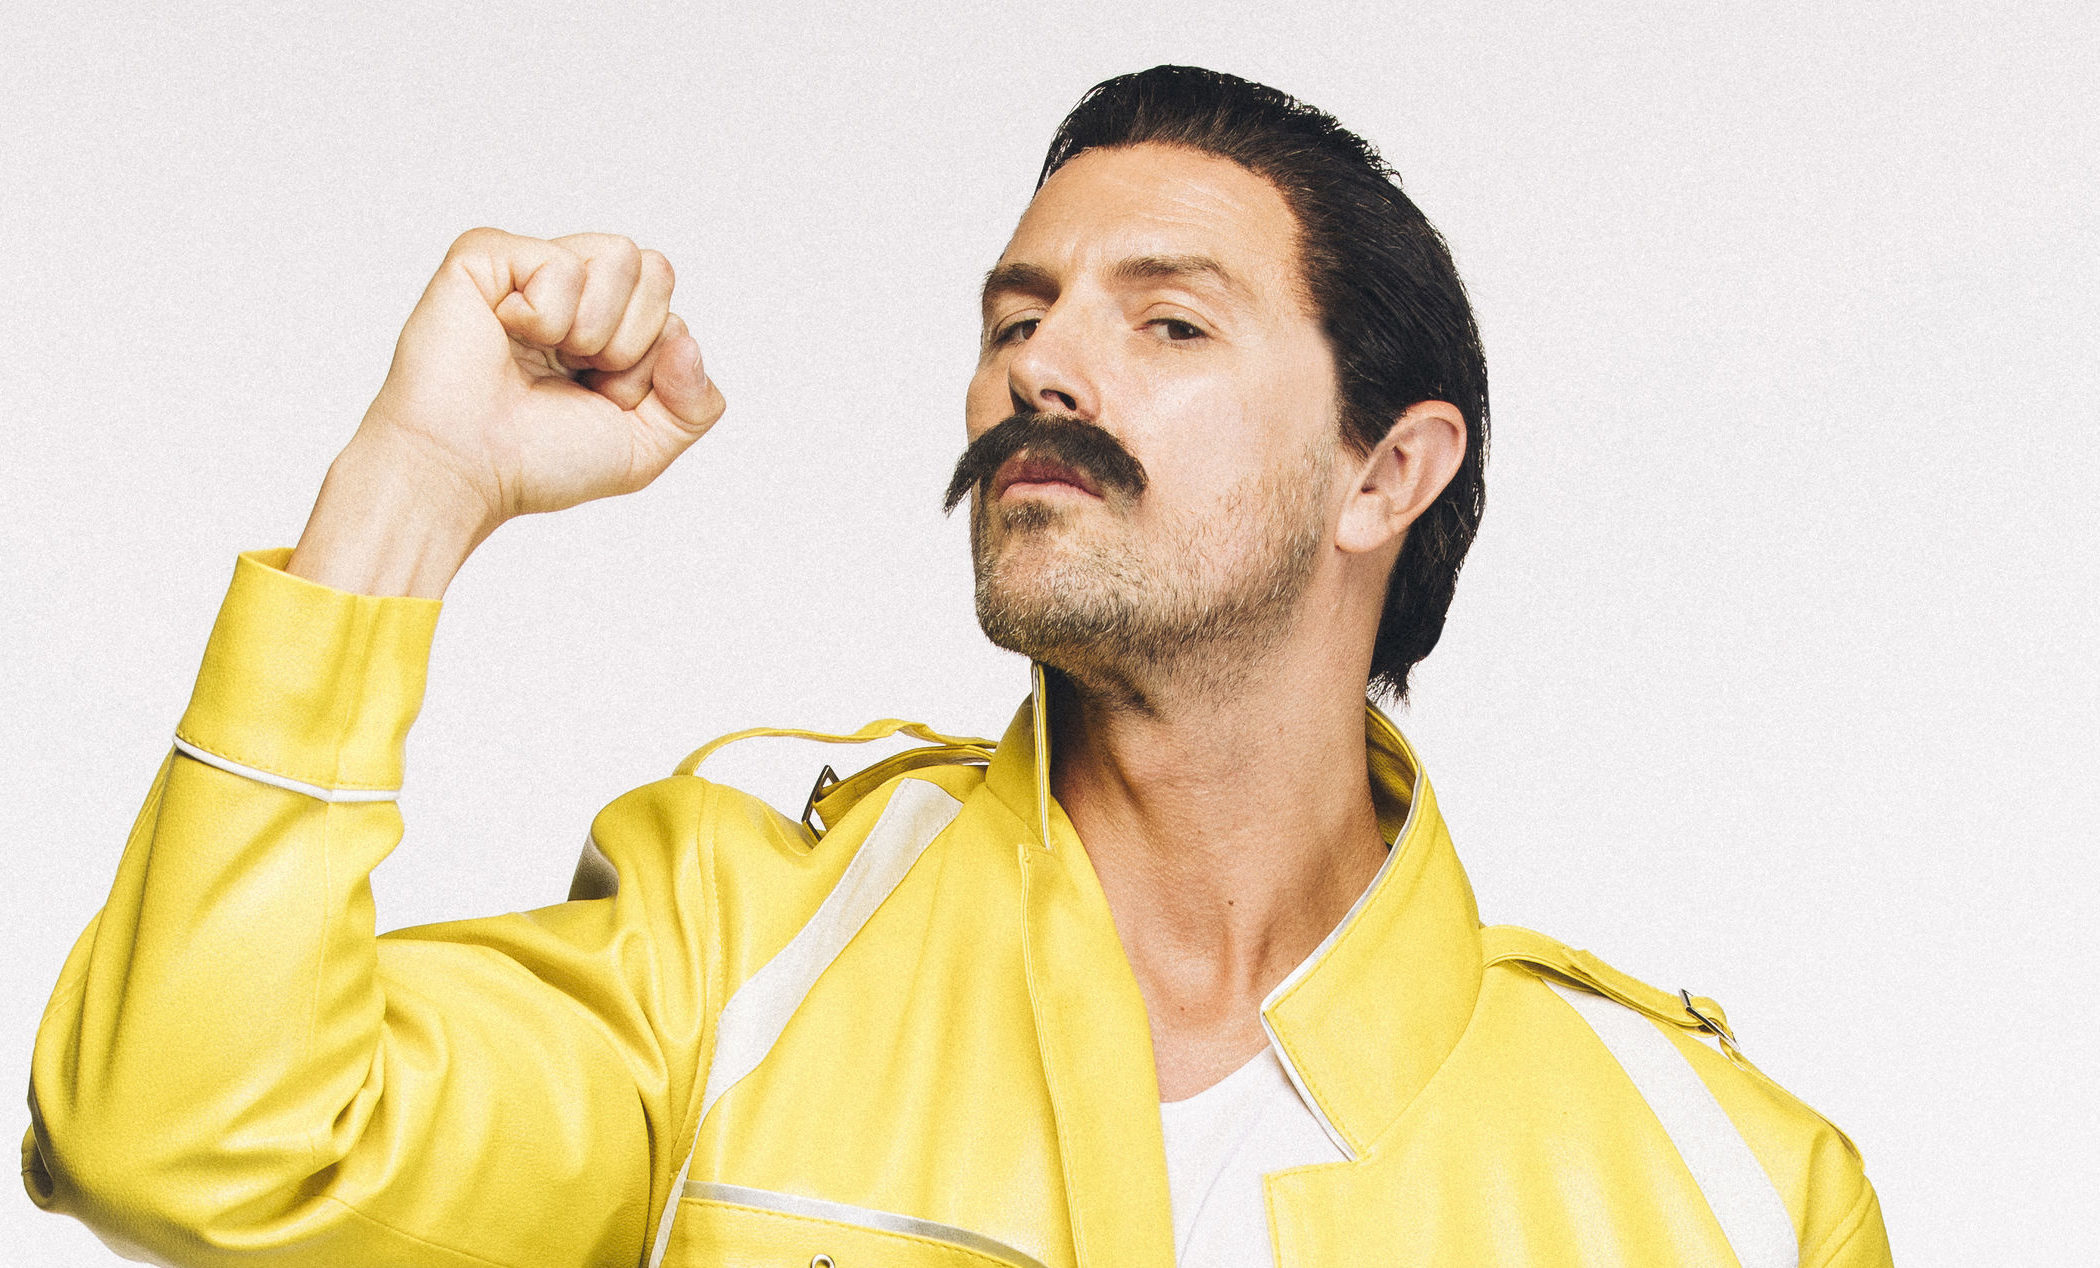 Paddy McGuiness recreating Freddie Mercury's moustache (Tom Dymond  / Movember)